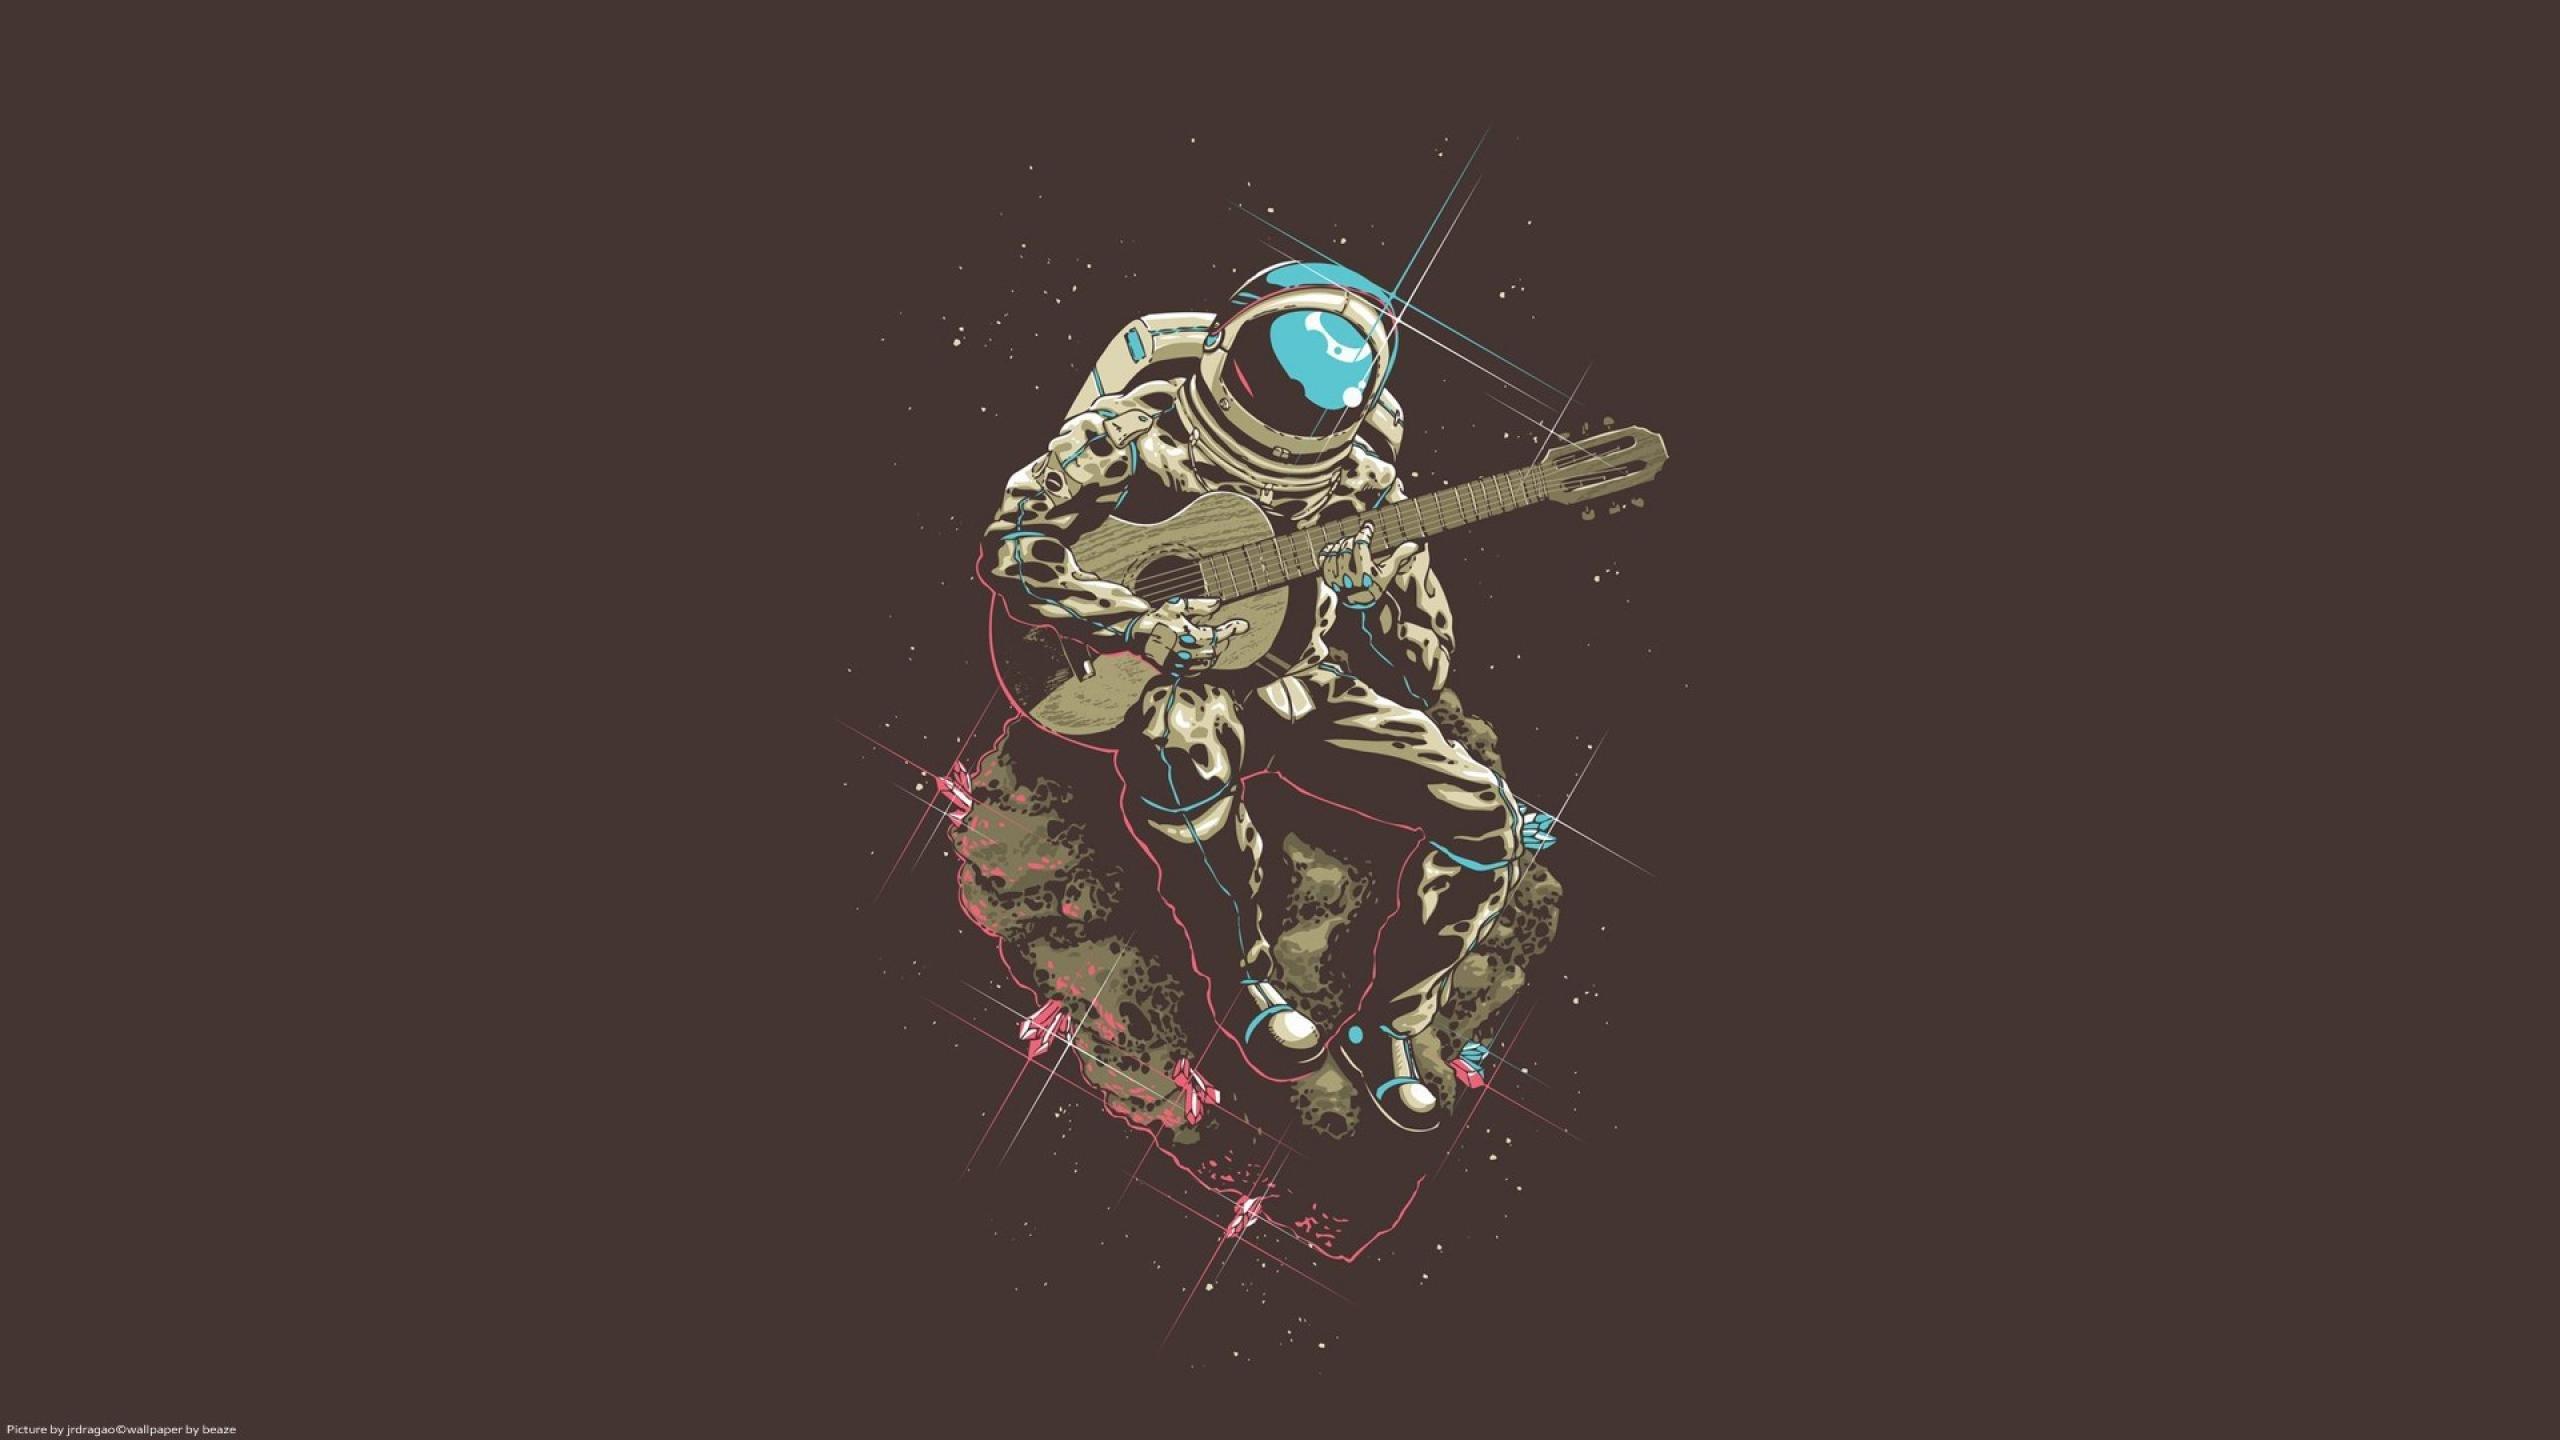 Fantastic Wallpaper Music Space - 5f15894aac44278ff4247e1252e55e62  2018_163659.jpg